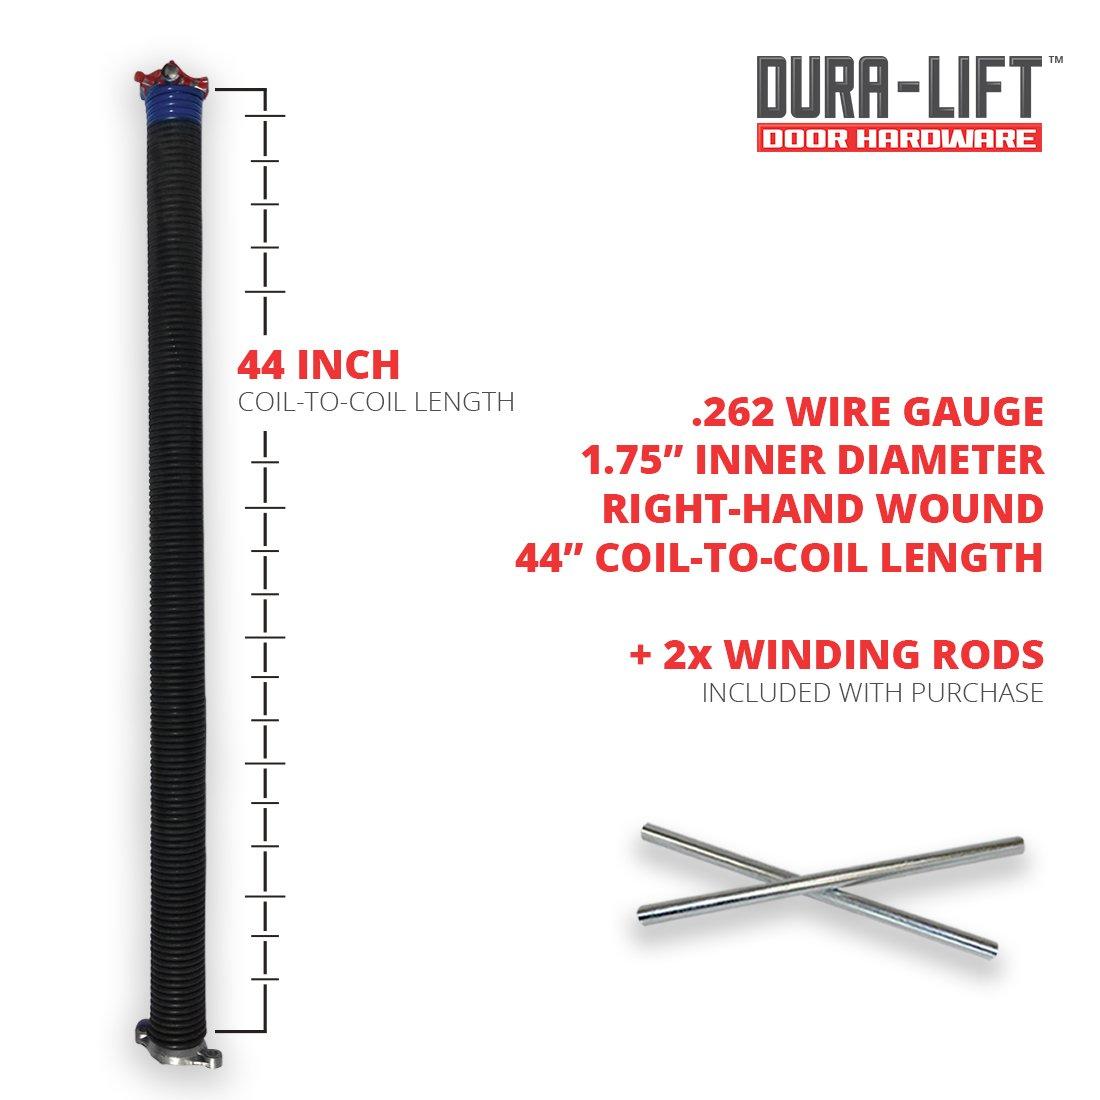 DURA-LIFT .262 x 2 x 38 Torsion Garage Springs Blue, Left /& Right Wound